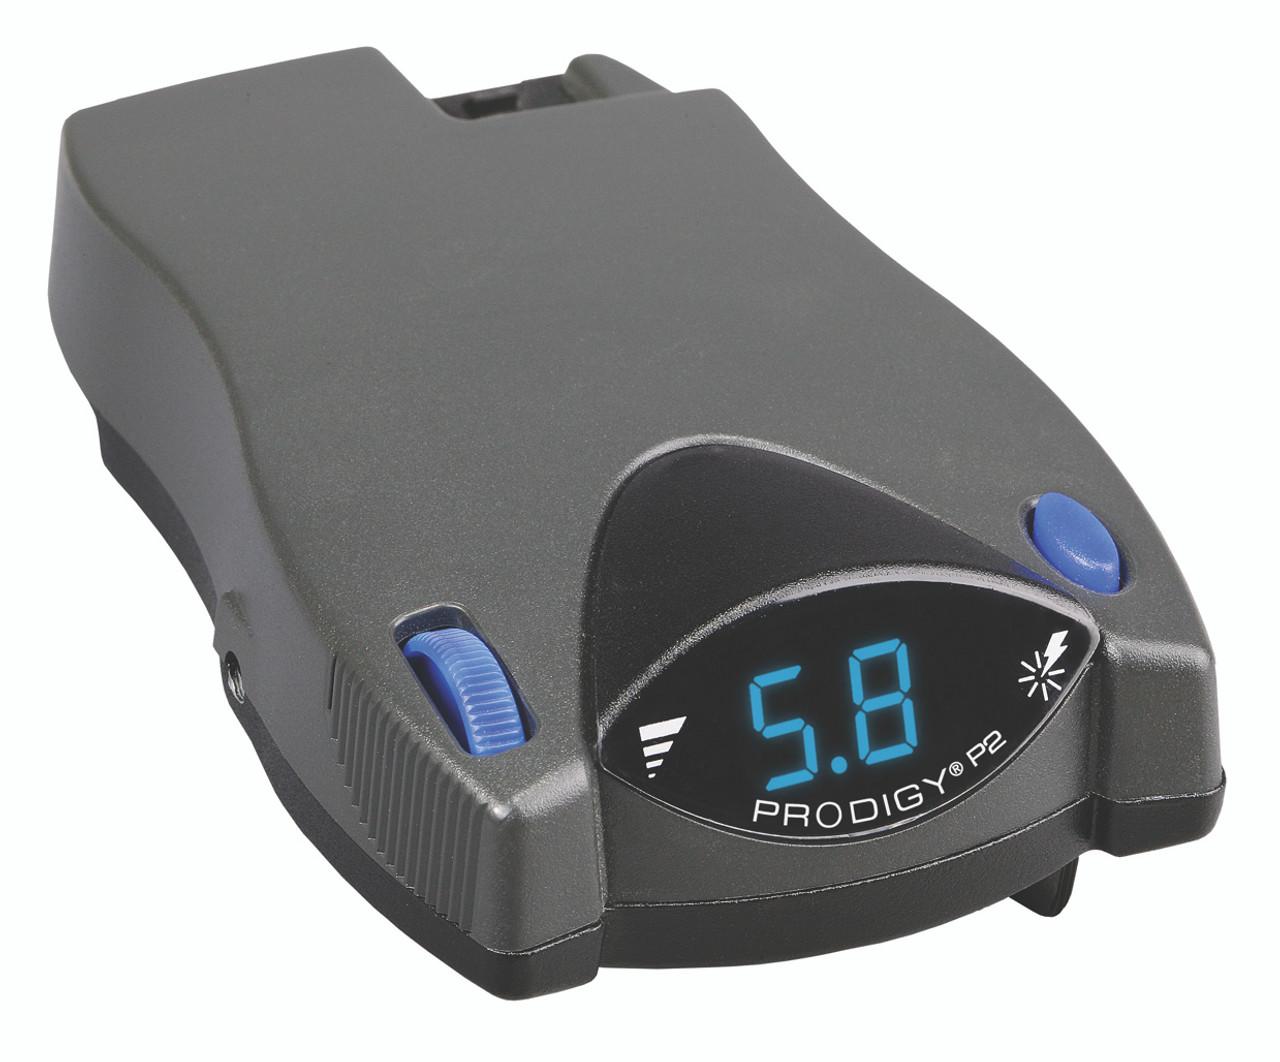 90885 tekonsha prodigy p2 proportional brake controller 2 4 6 8 brake systems croft trailer supply [ 1239 x 1028 Pixel ]